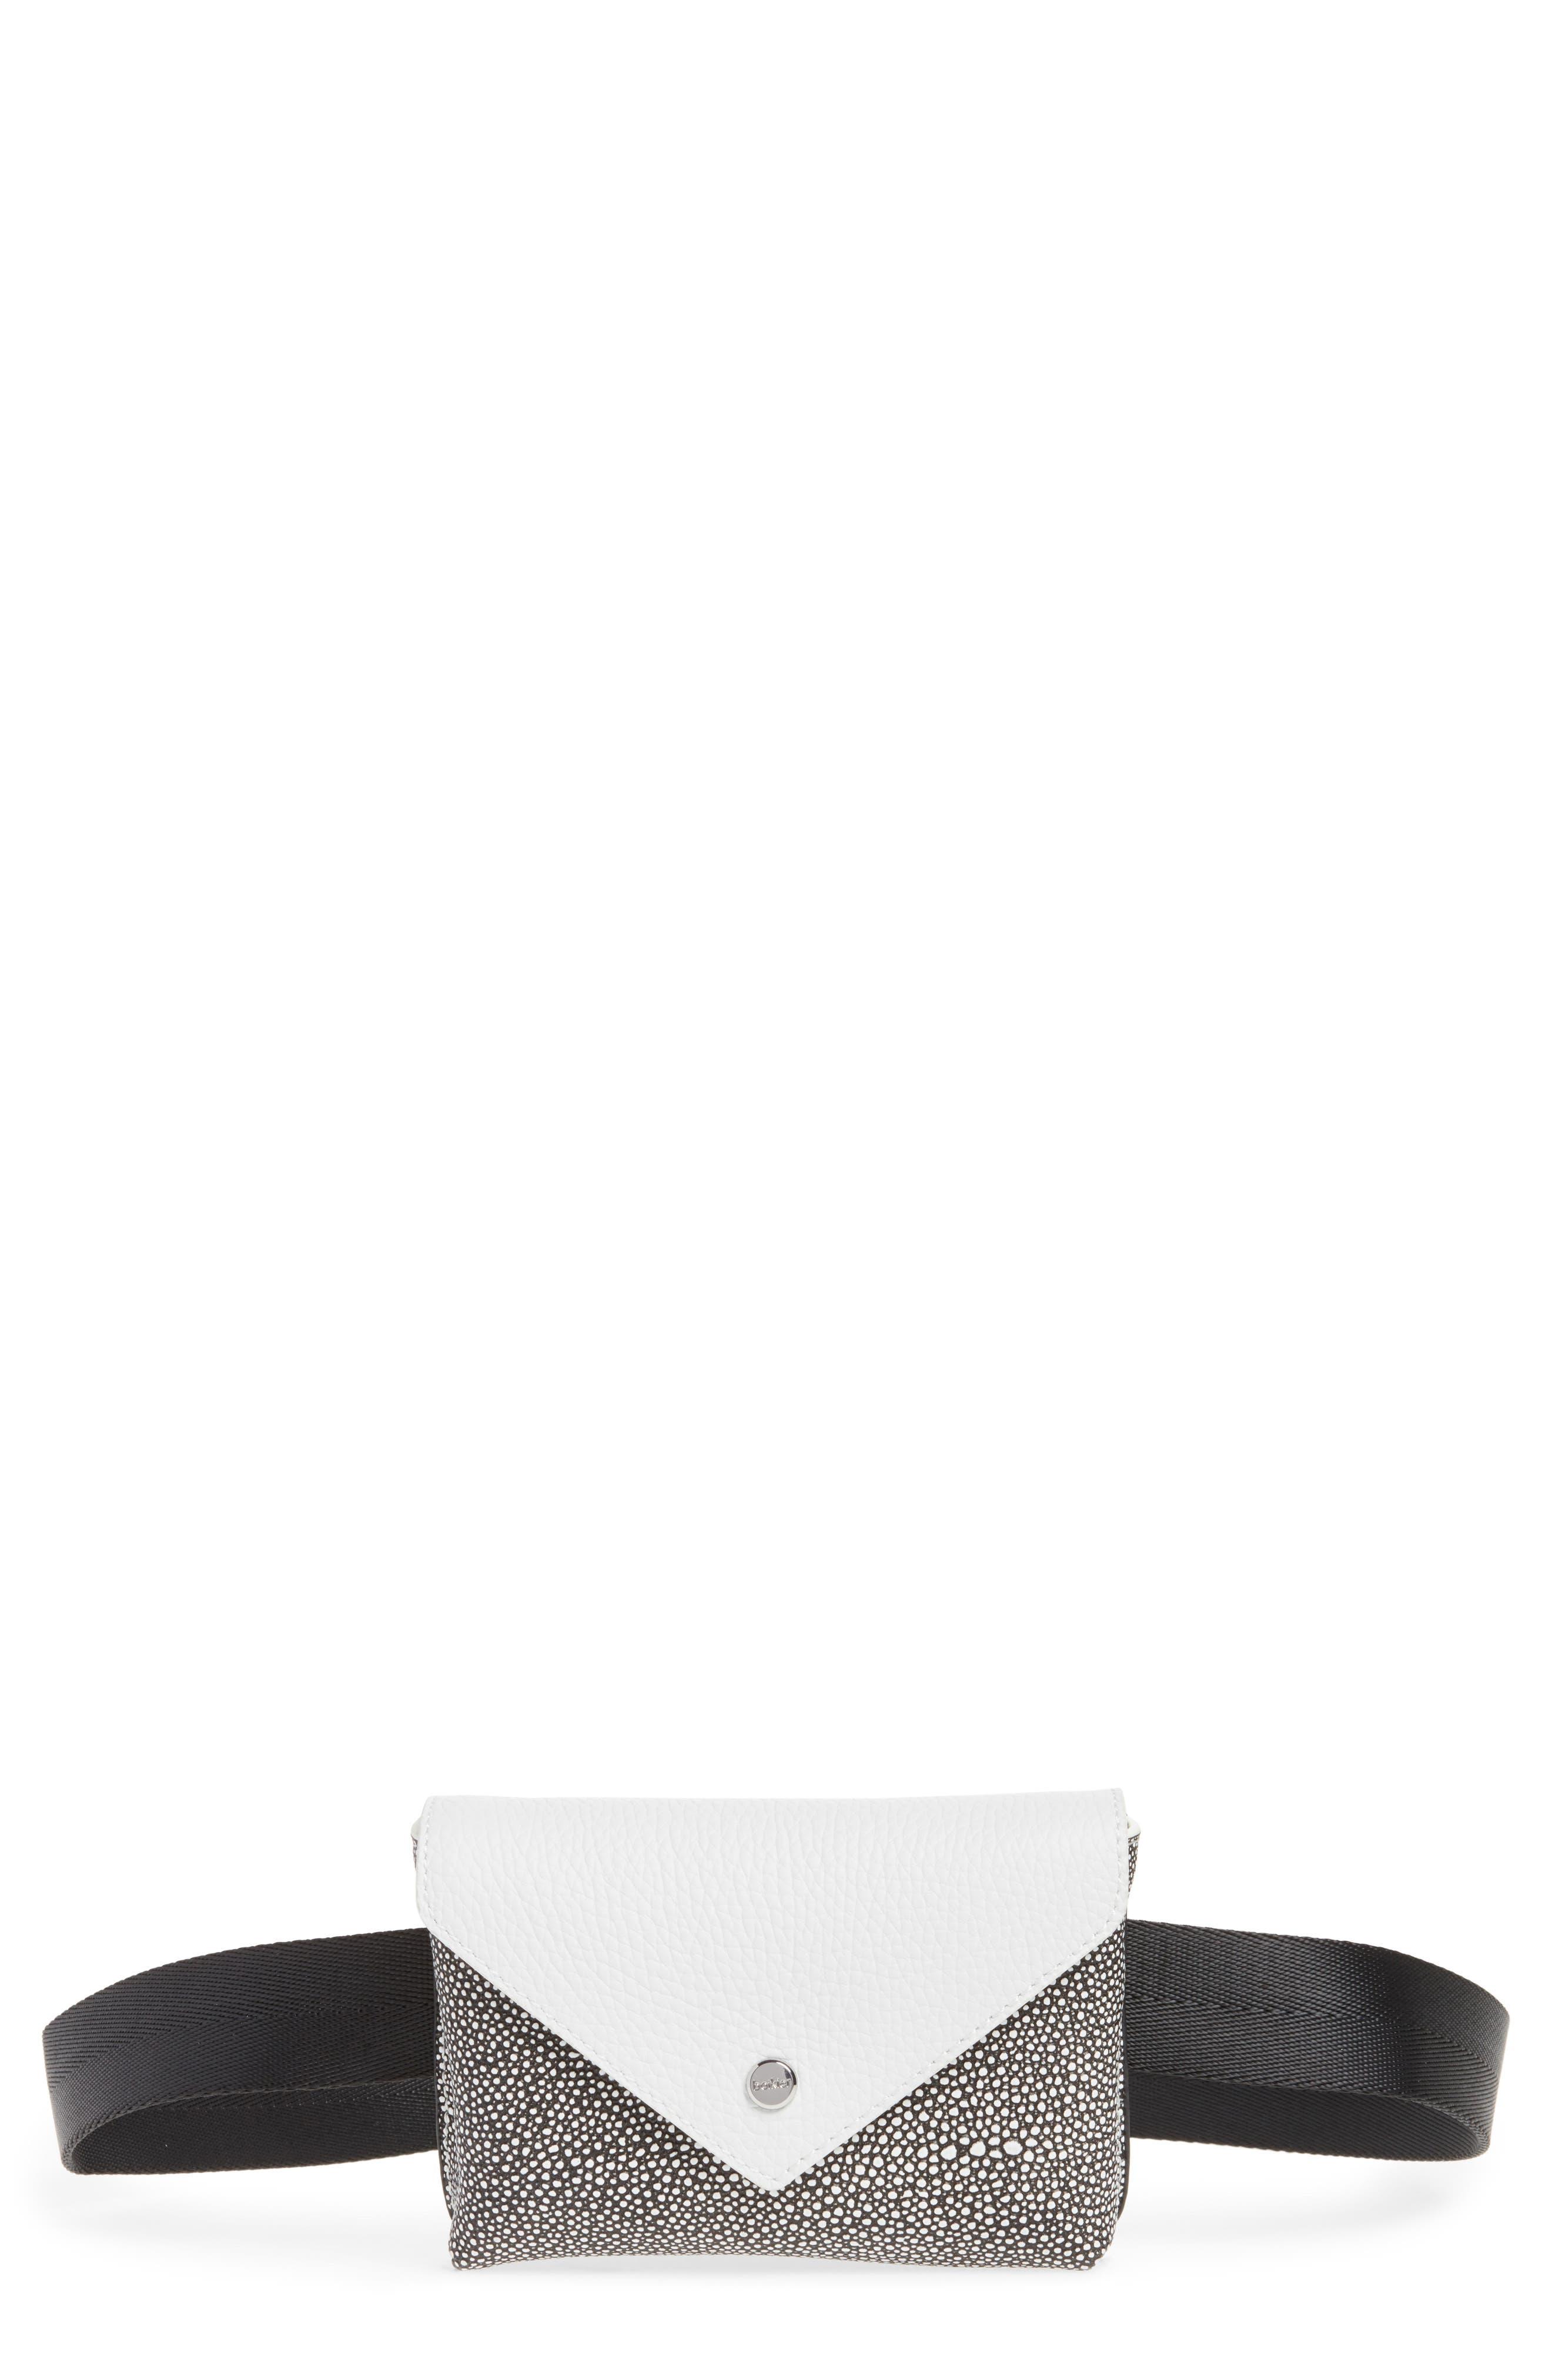 Vivi Calfskin Leather Convertible Belt Bag,                             Main thumbnail 1, color,                             Chalk Stingray